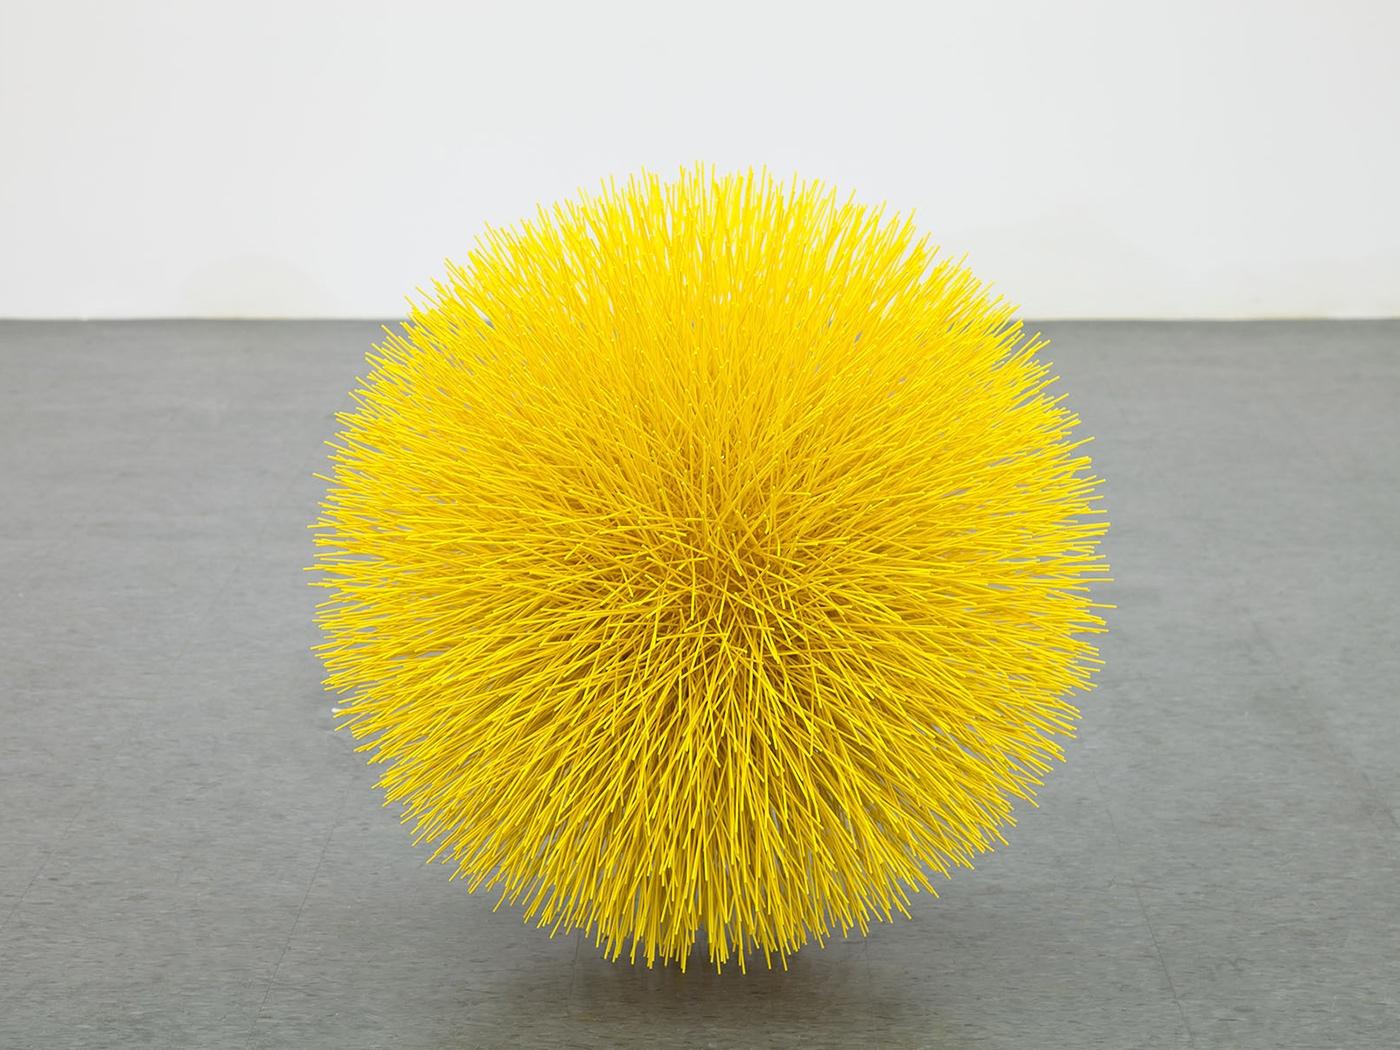 TOM FRIEDMAN, Untitled (sun), 2012